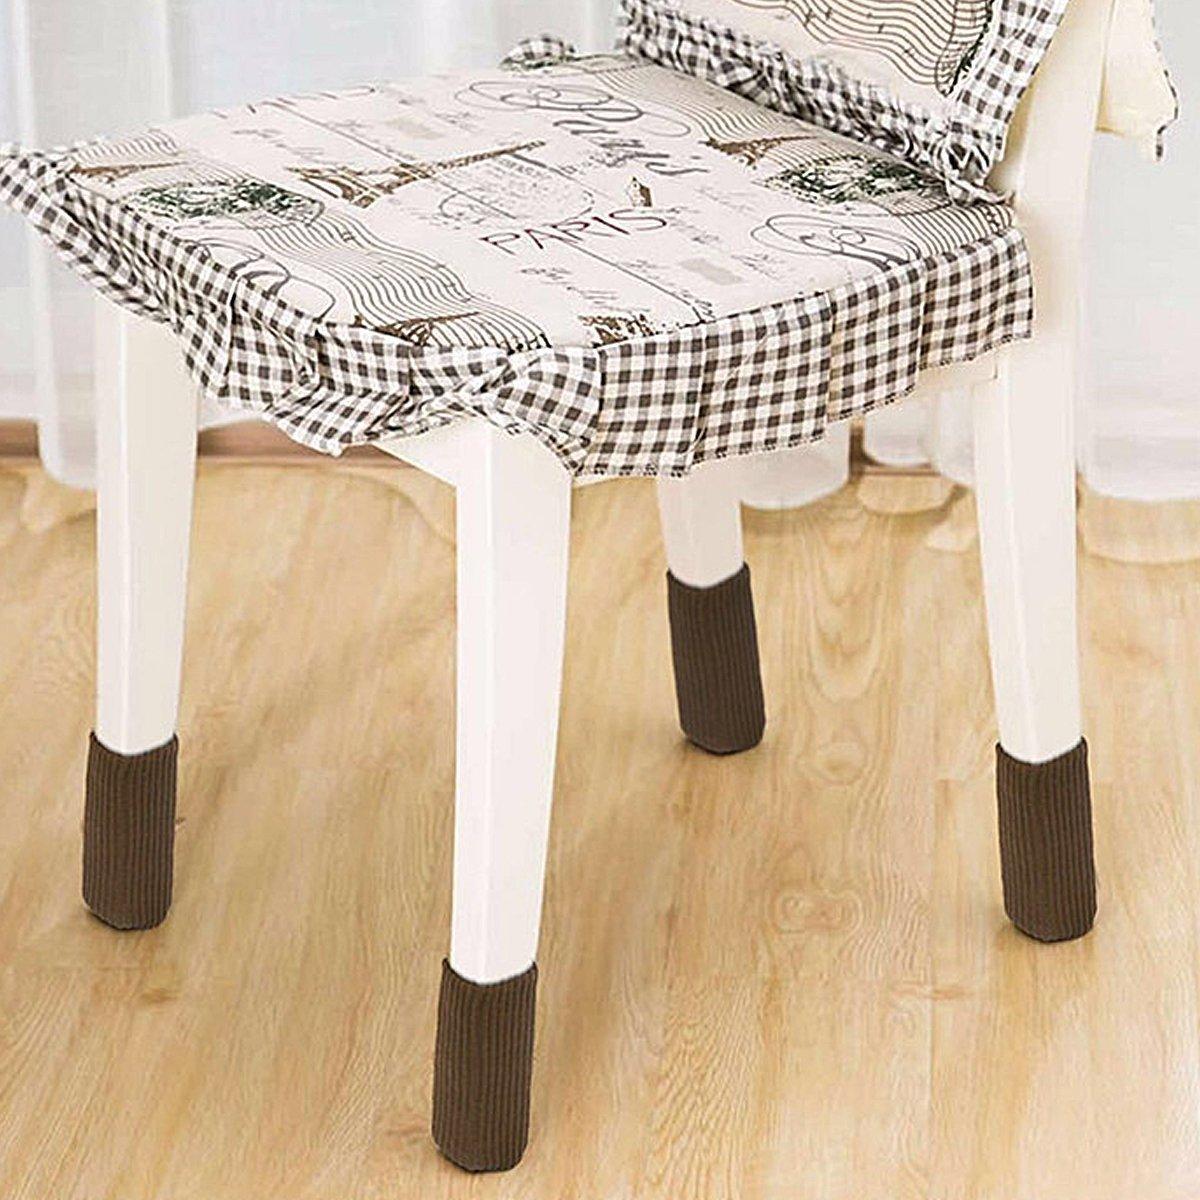 24pcs Chair Socks Brown Elastic Wood Floor Furniture Chair Leg Feet Protectors Covers Caps Set